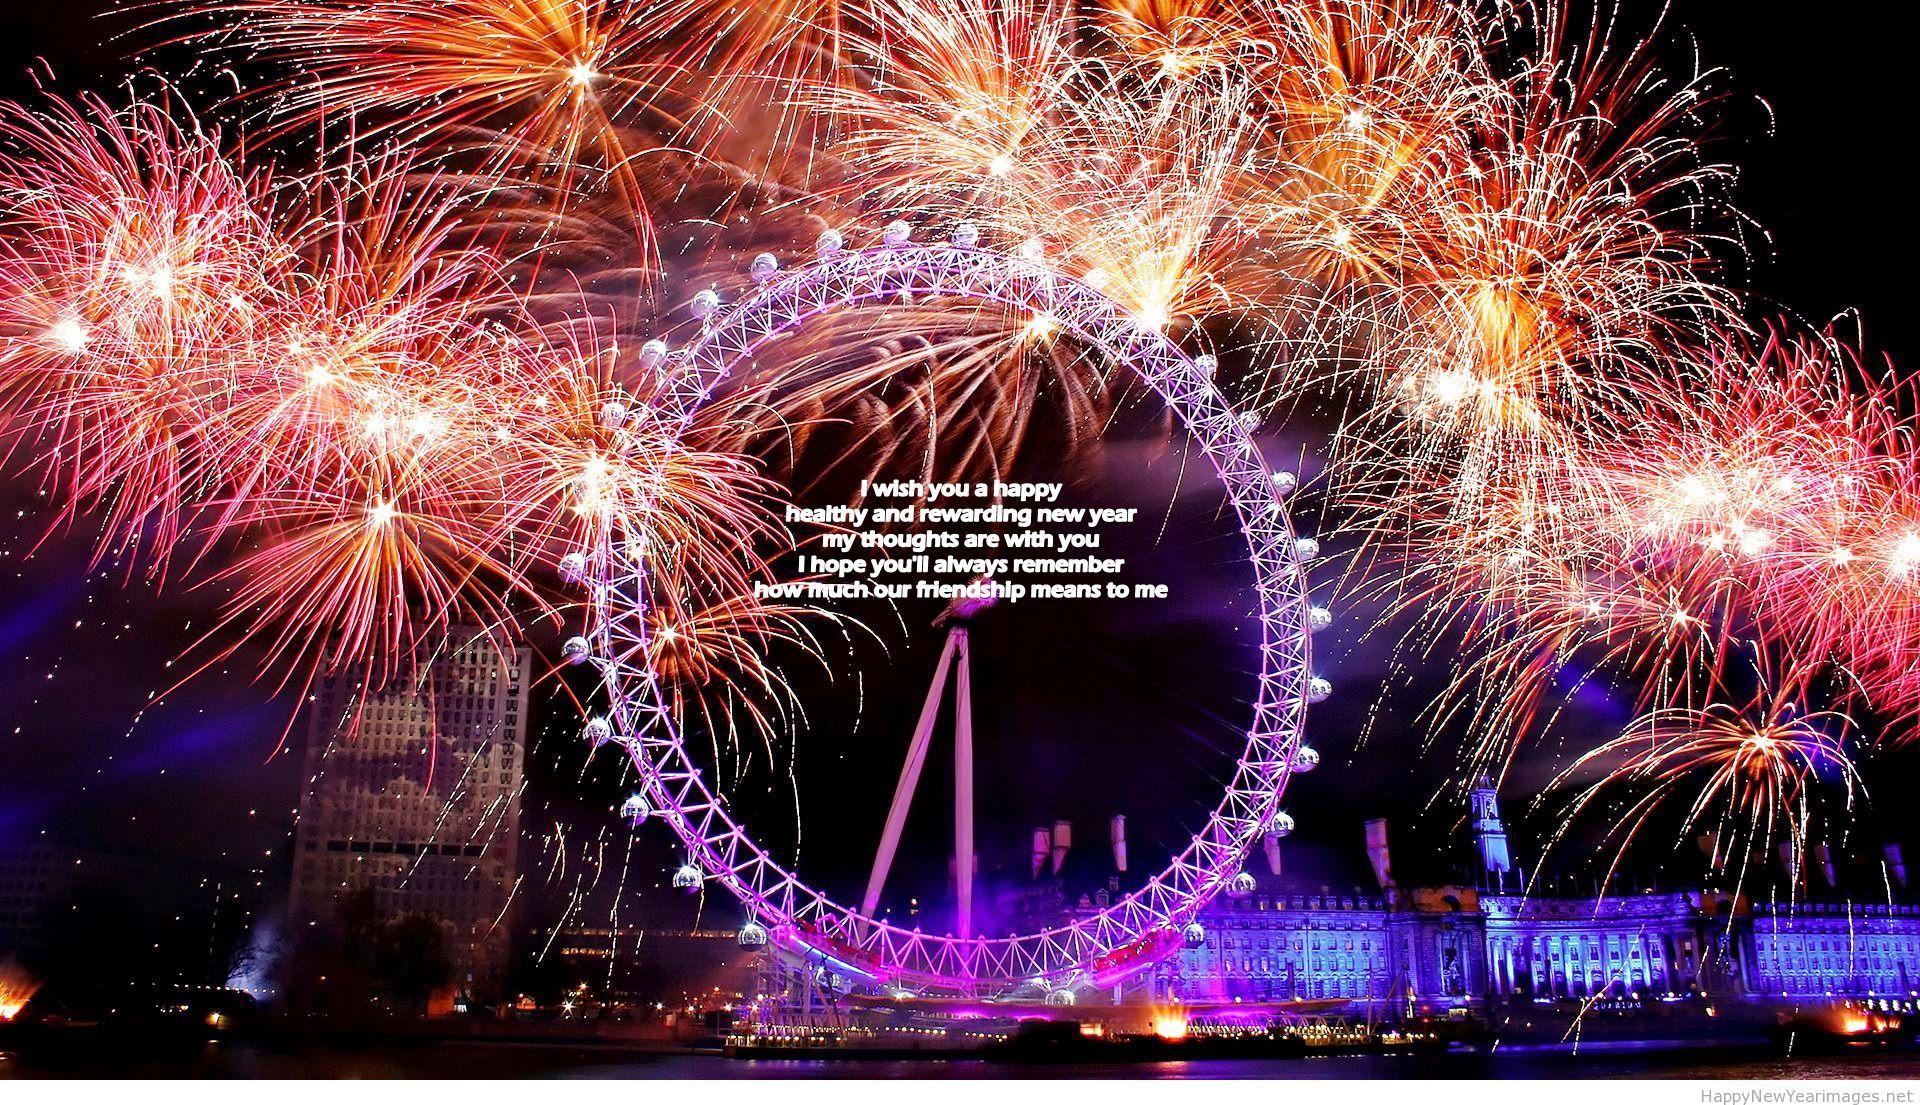 New year celebration happy new year hd fireworks Happy